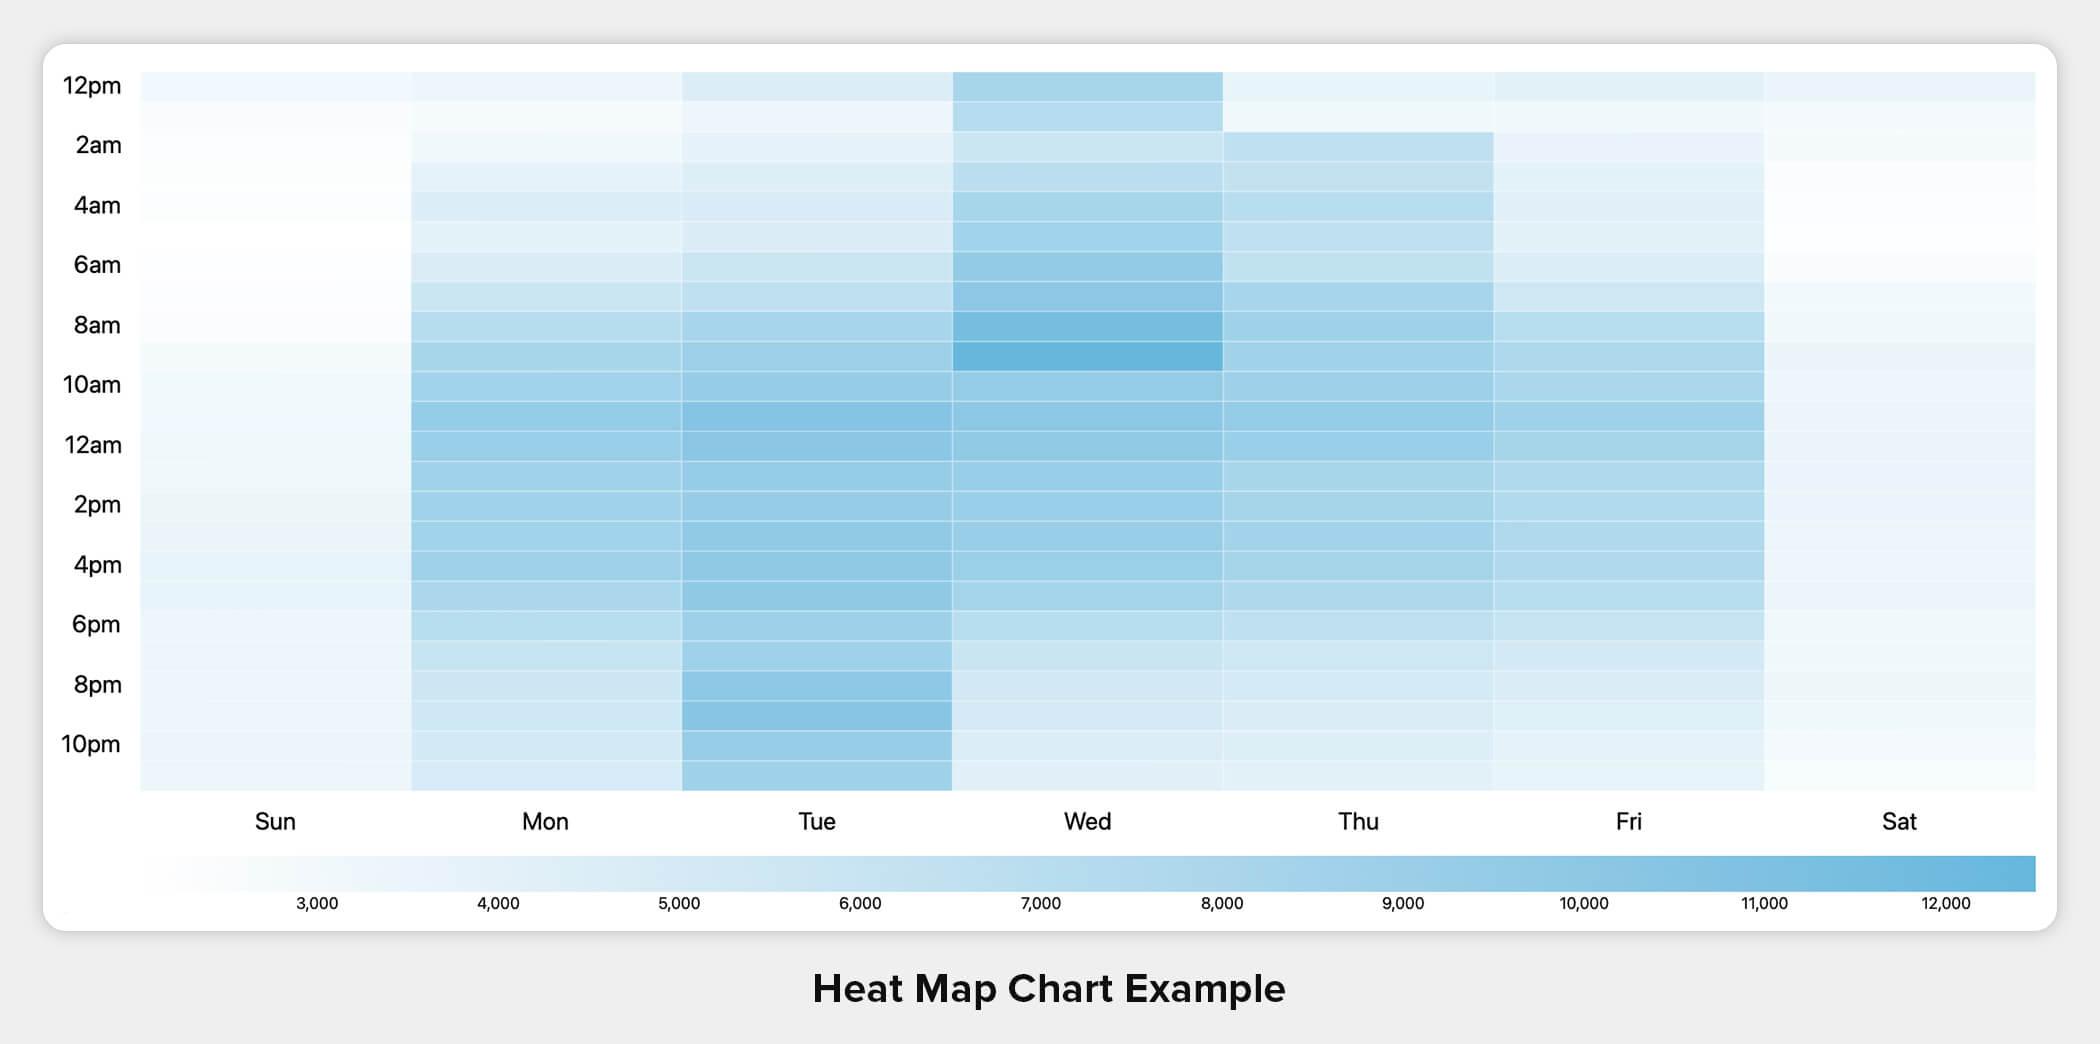 Heat Map Chart Example